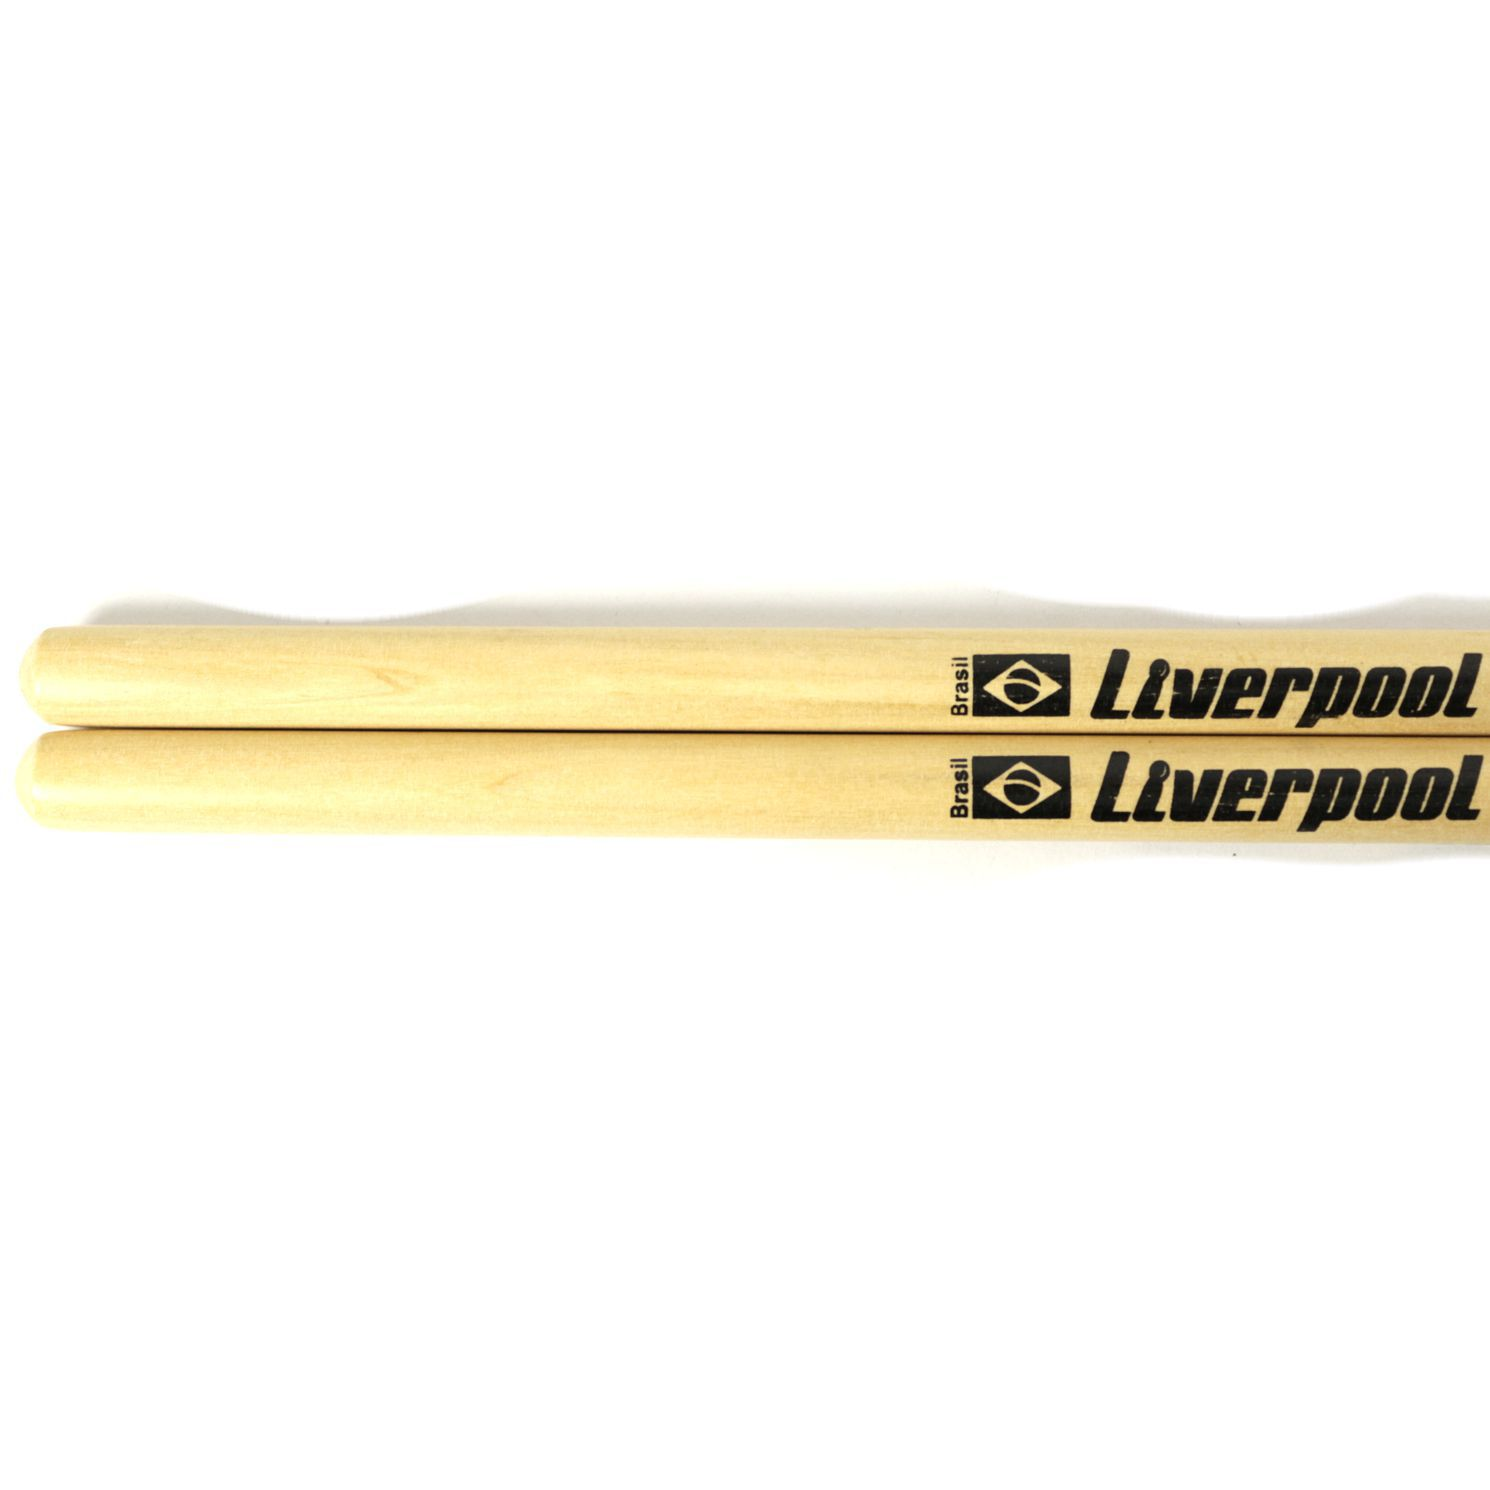 Baquetas 5B em Marfim Liverpool Classic Series Ponta de NYLON LL 5BN